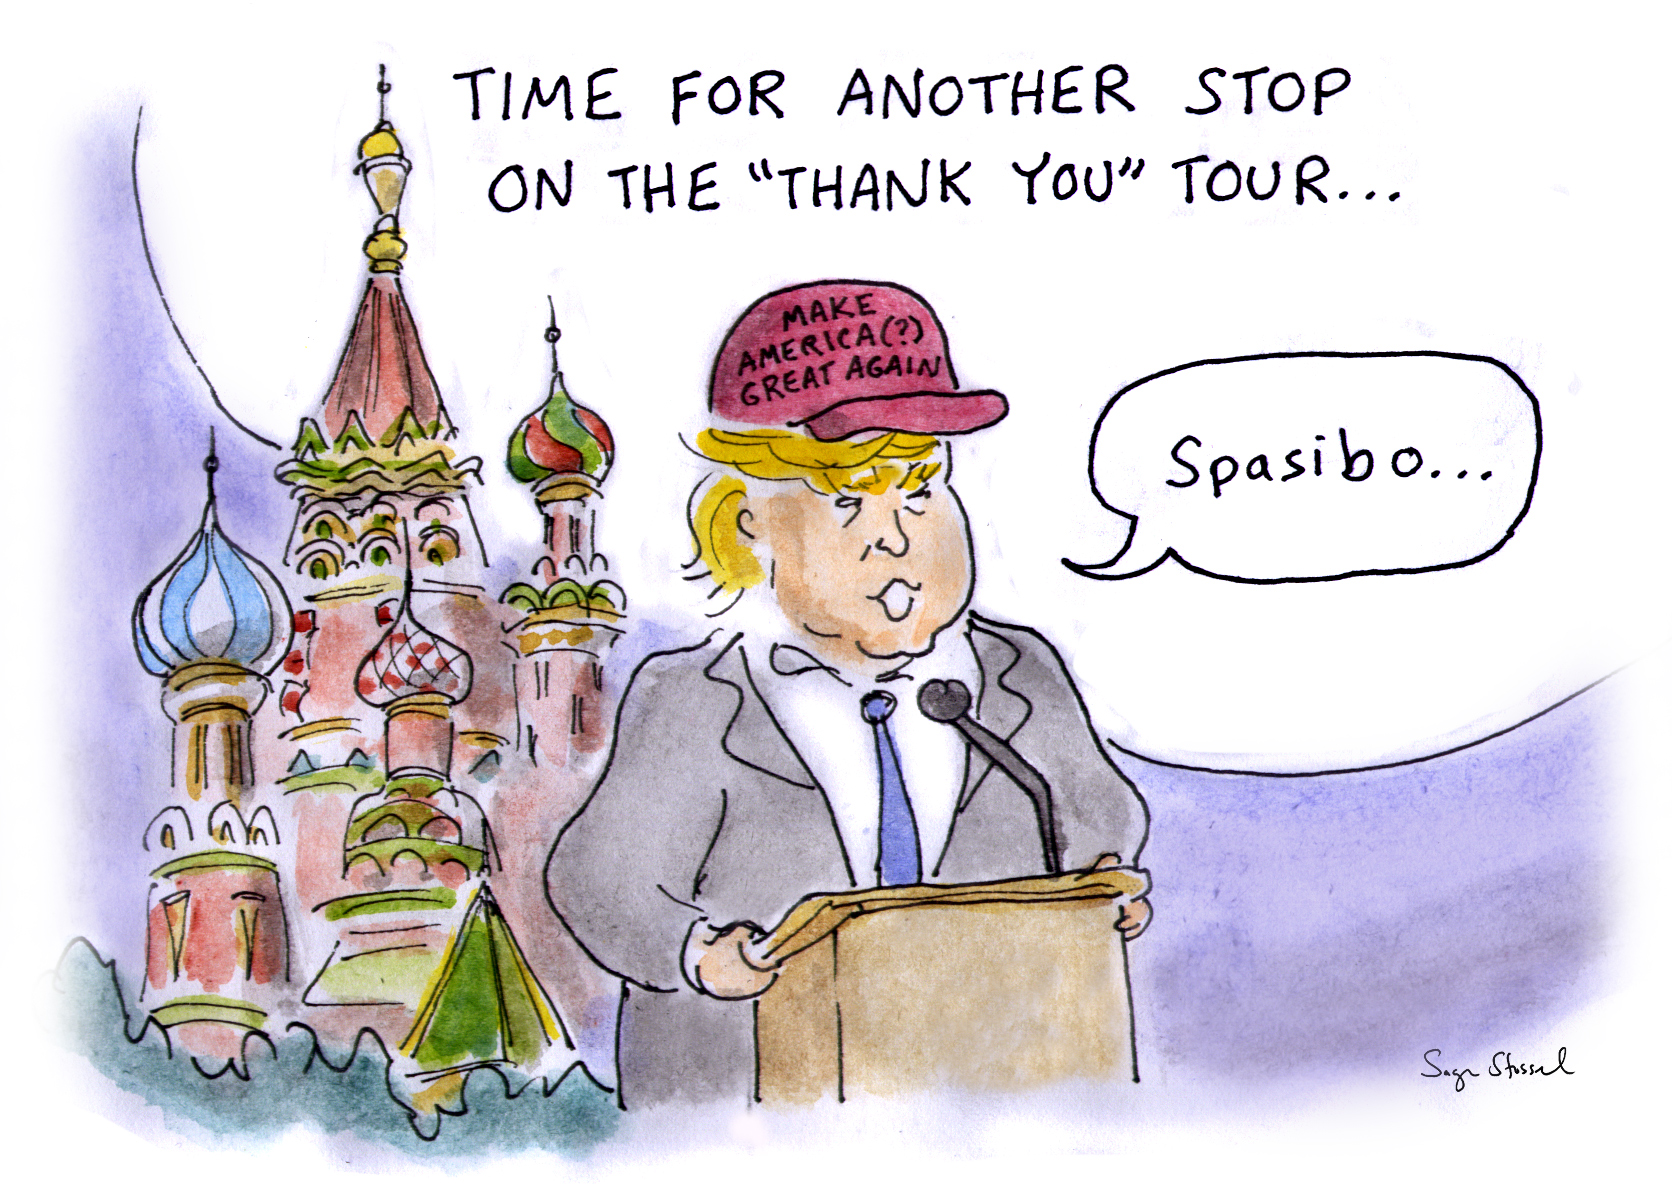 vladimir putin, election hacking, russia, meddling, destabilize, doubt, cia, trump, thank you tour, cartoon